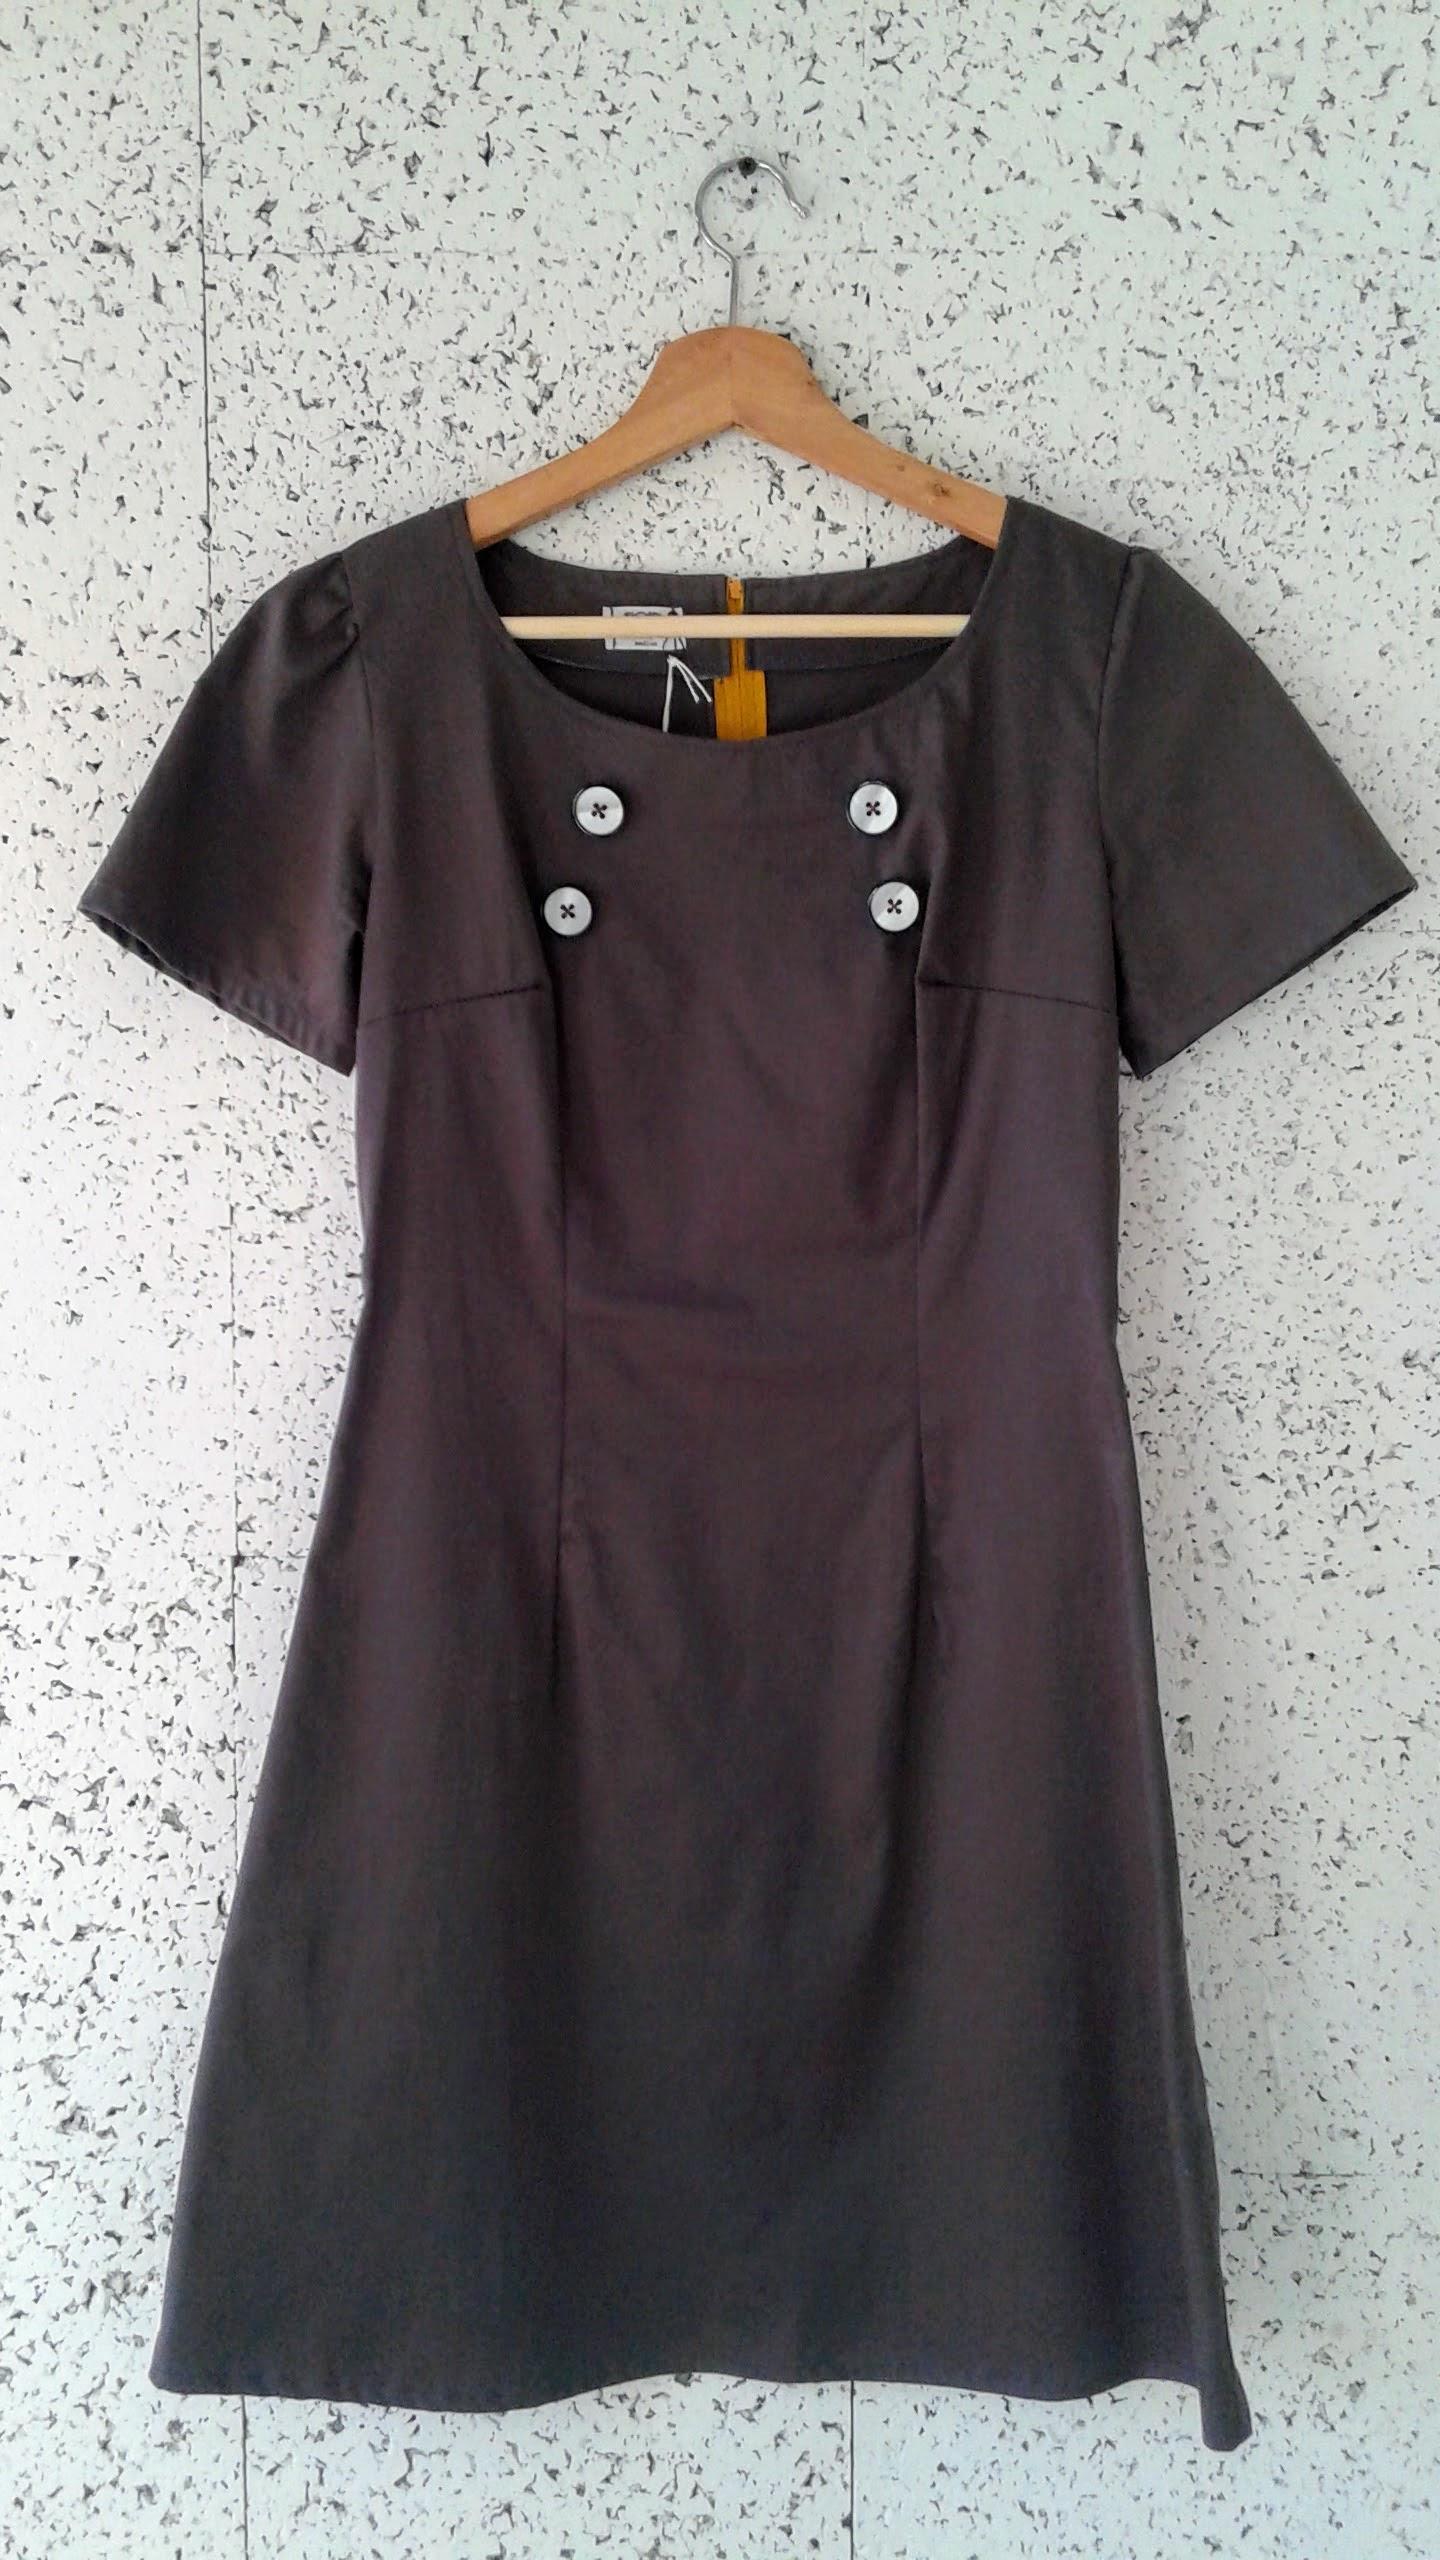 Devil May Wear dress (NWT); Size M, $48